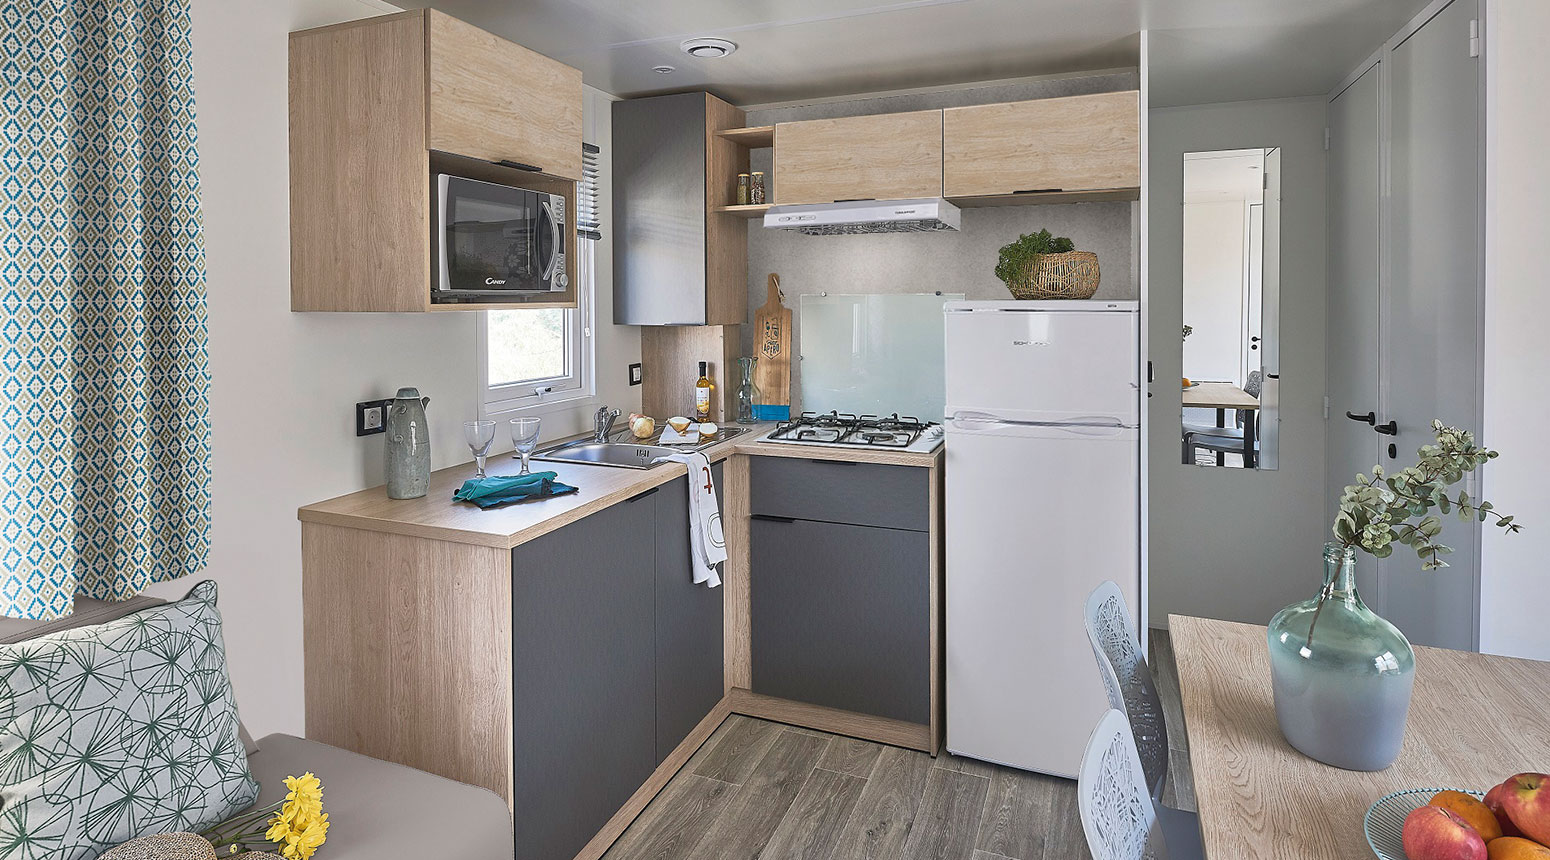 Coin cuisine du mobil home vente de mobil home Bidart Camping Le Ruisseau